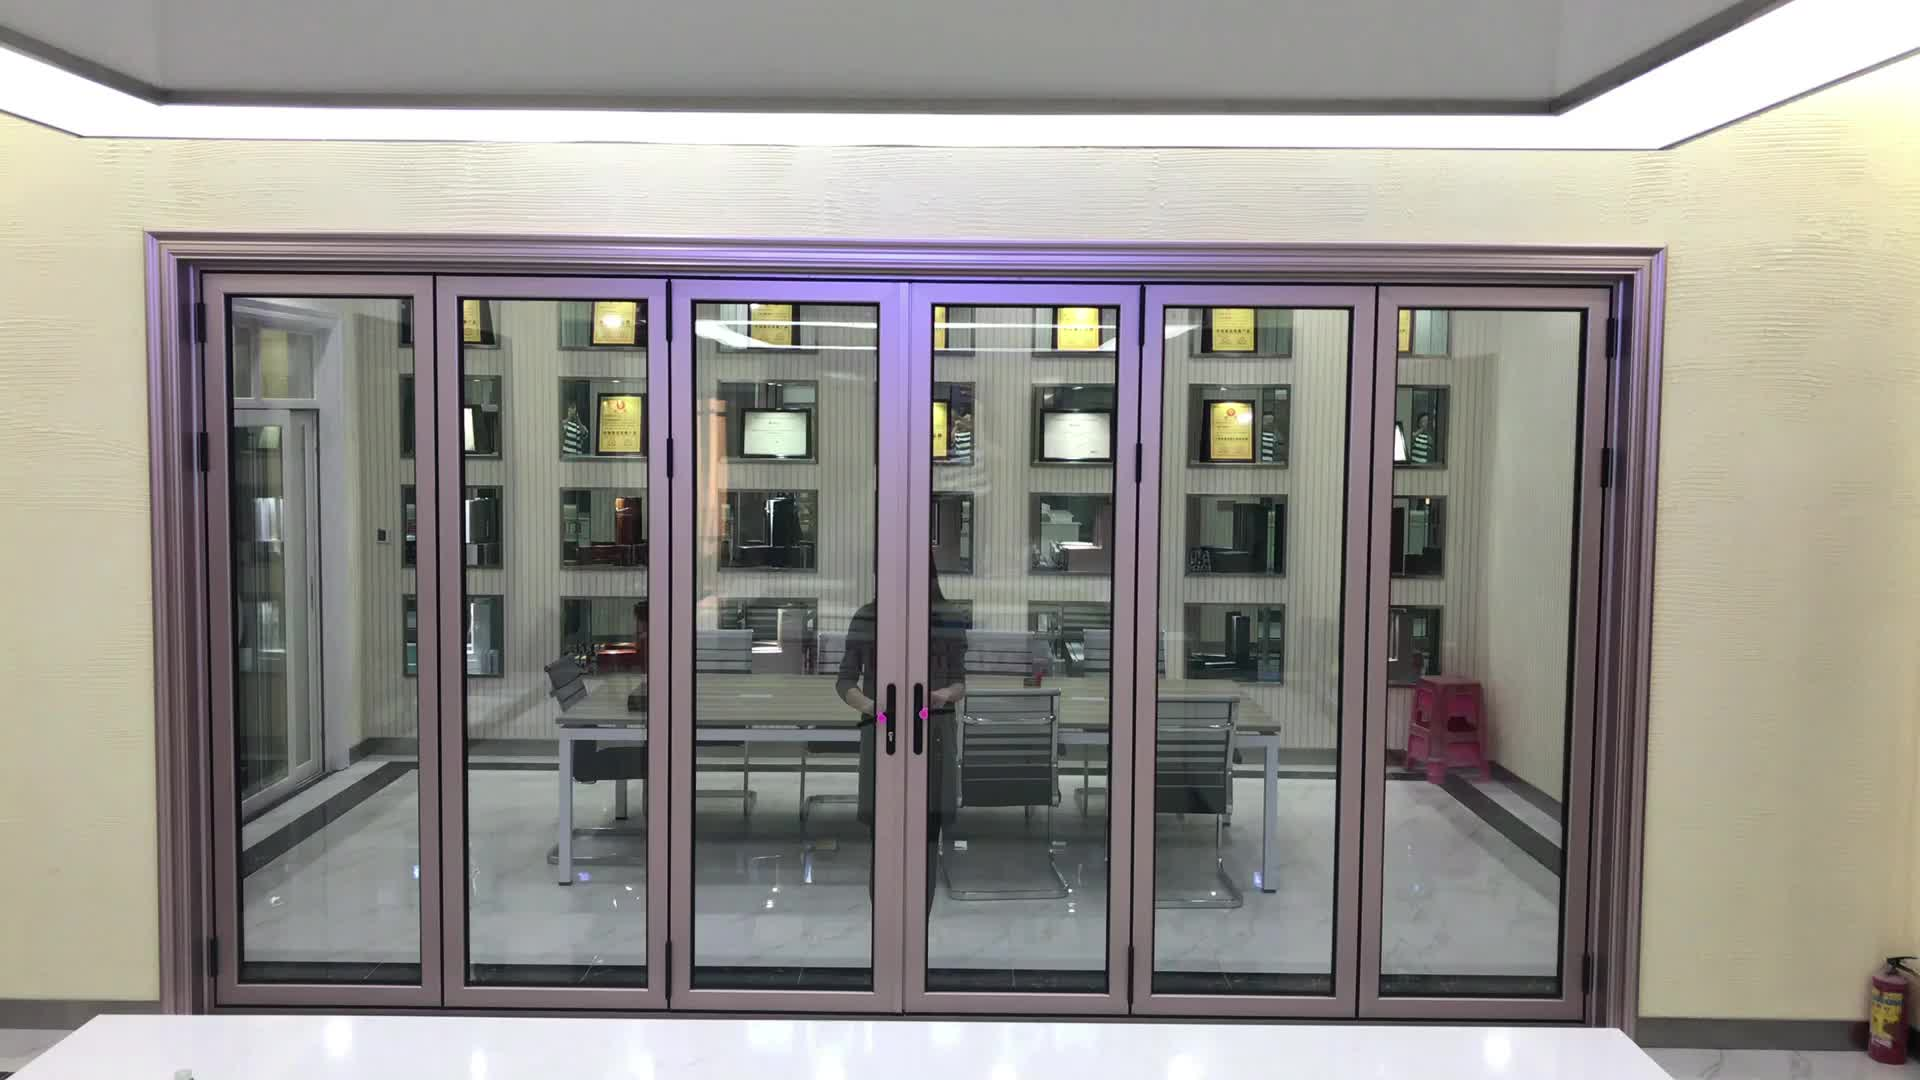 High quality external balcony aluminum thermally efficient bi-fold doors